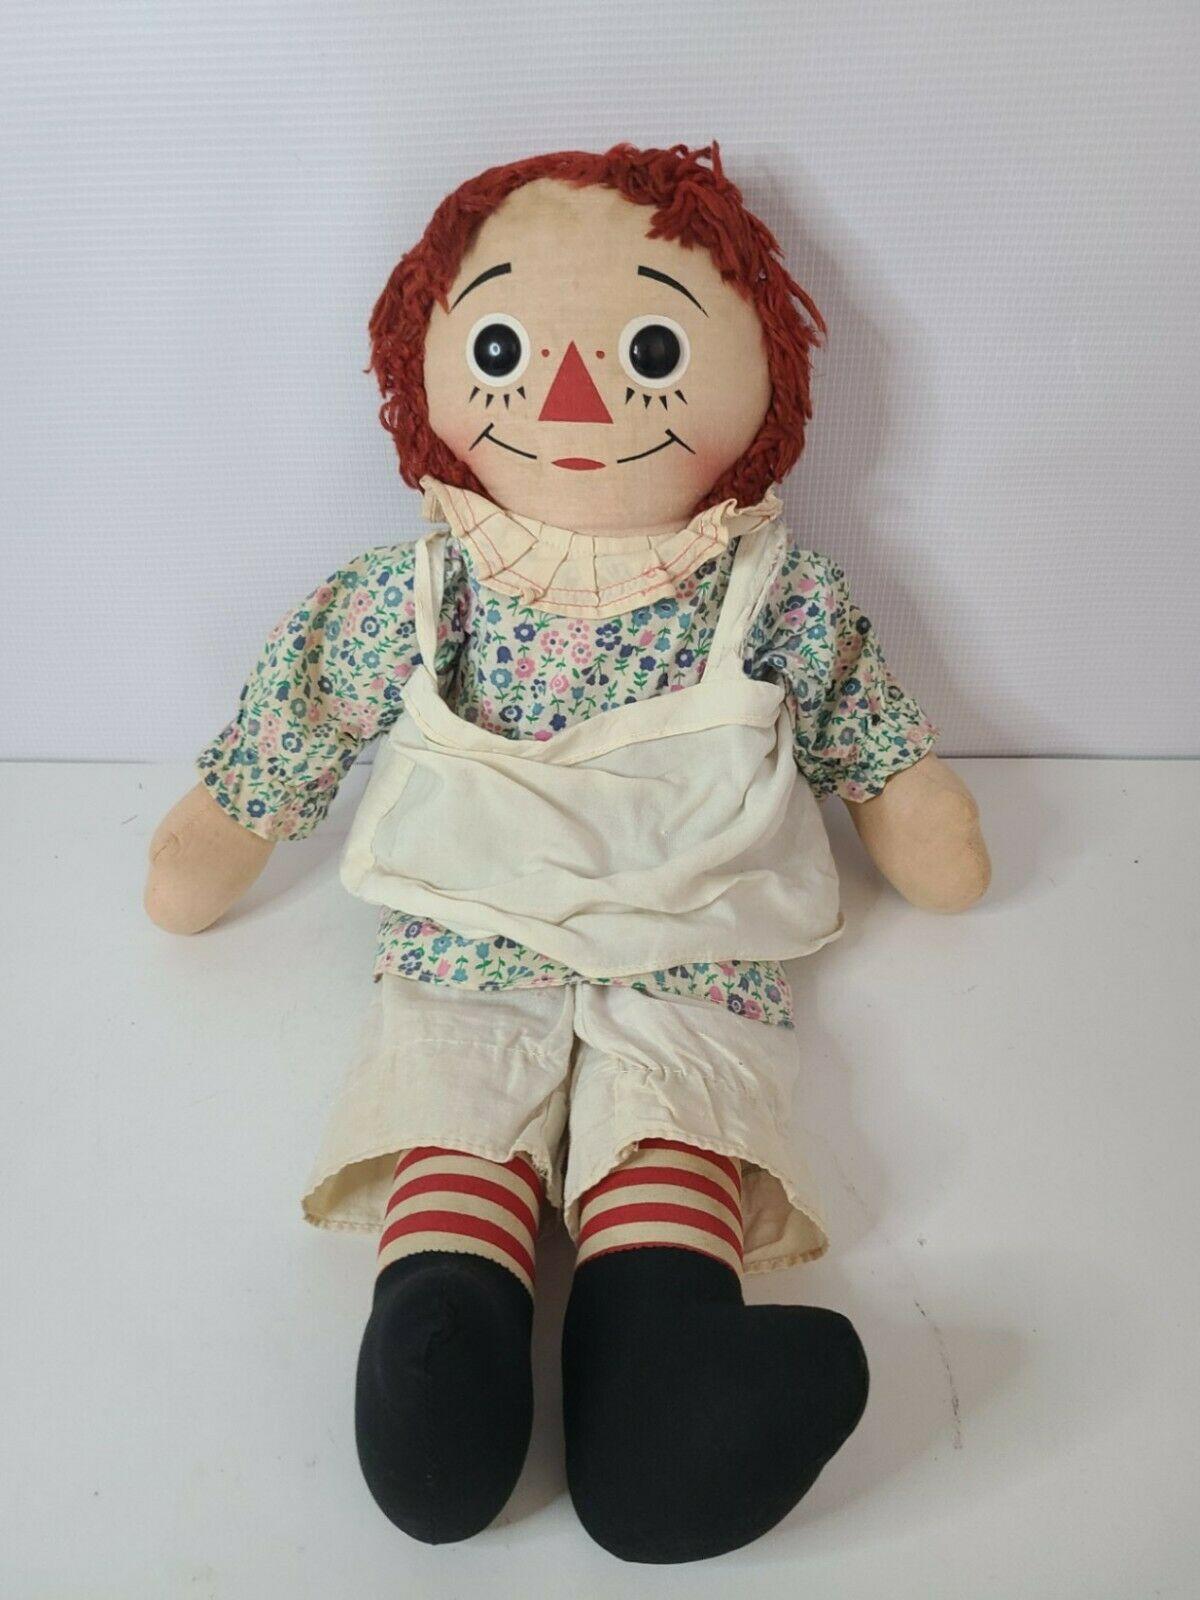 "Vintage Raggedy Ann Doll By Knickerbocker Rare 1960's 20 "" Rag Soft Doll Dressed - $65.99"